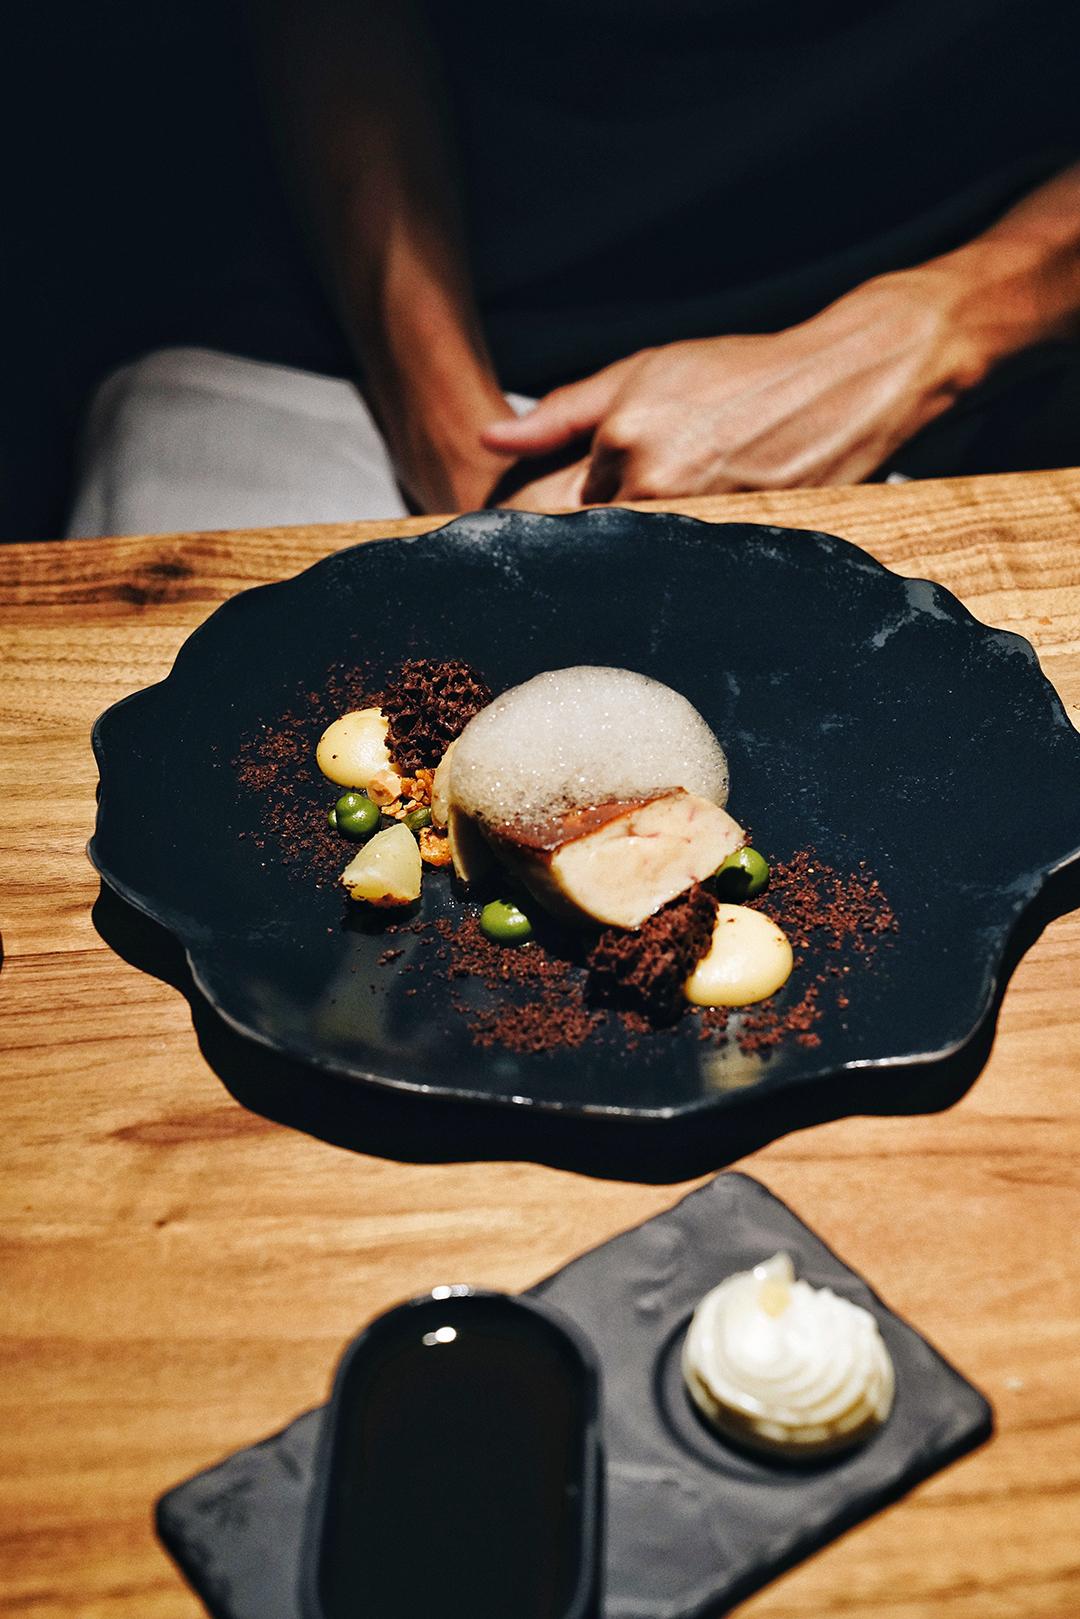 Seared foie gras, apple, granola, beetroot, coffee